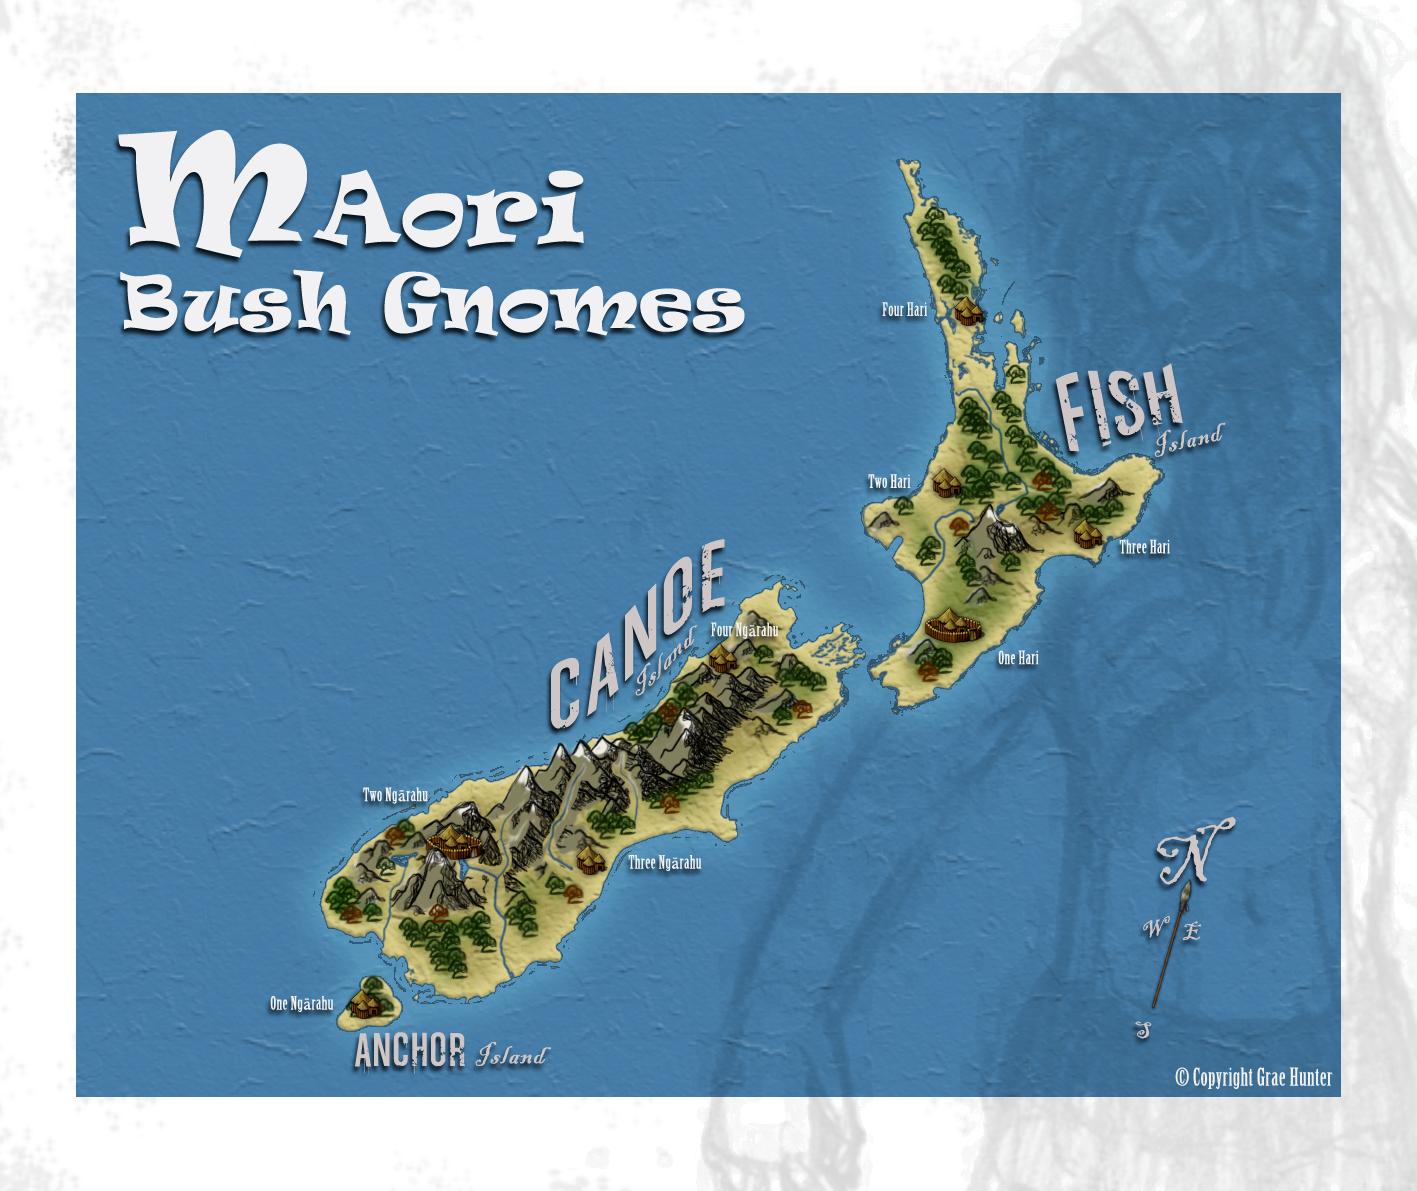 Maori Bush Gnomes - Map